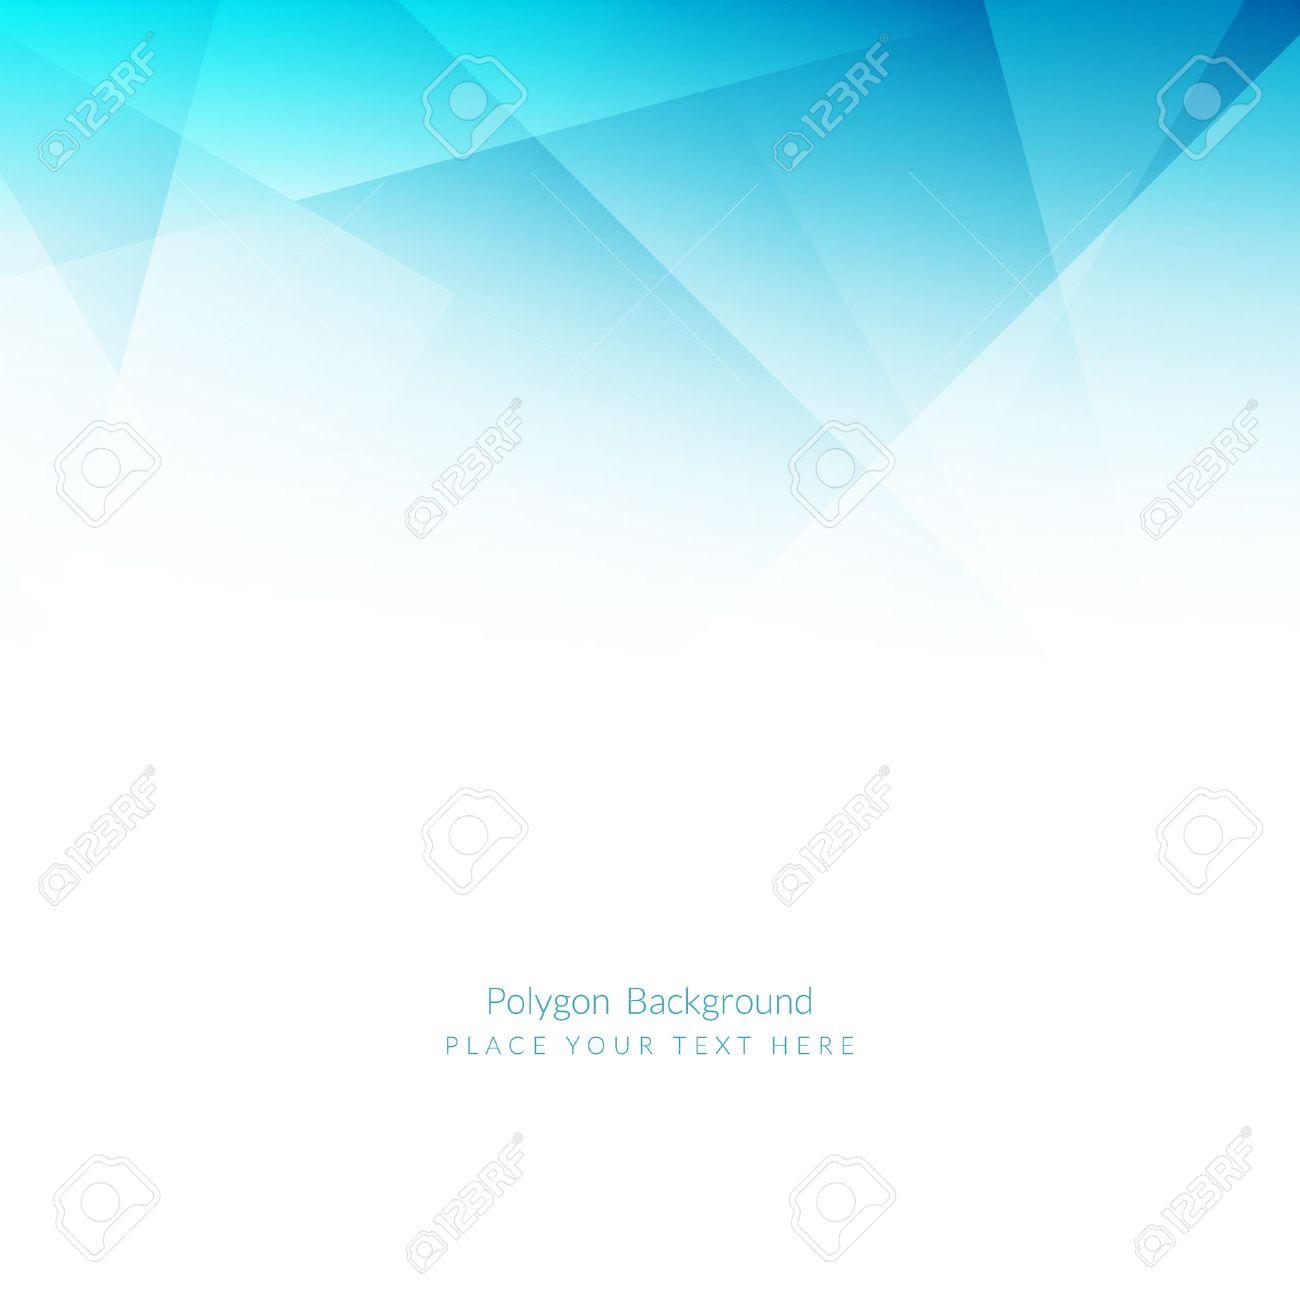 Light blue color polygonal shape background - 53197712